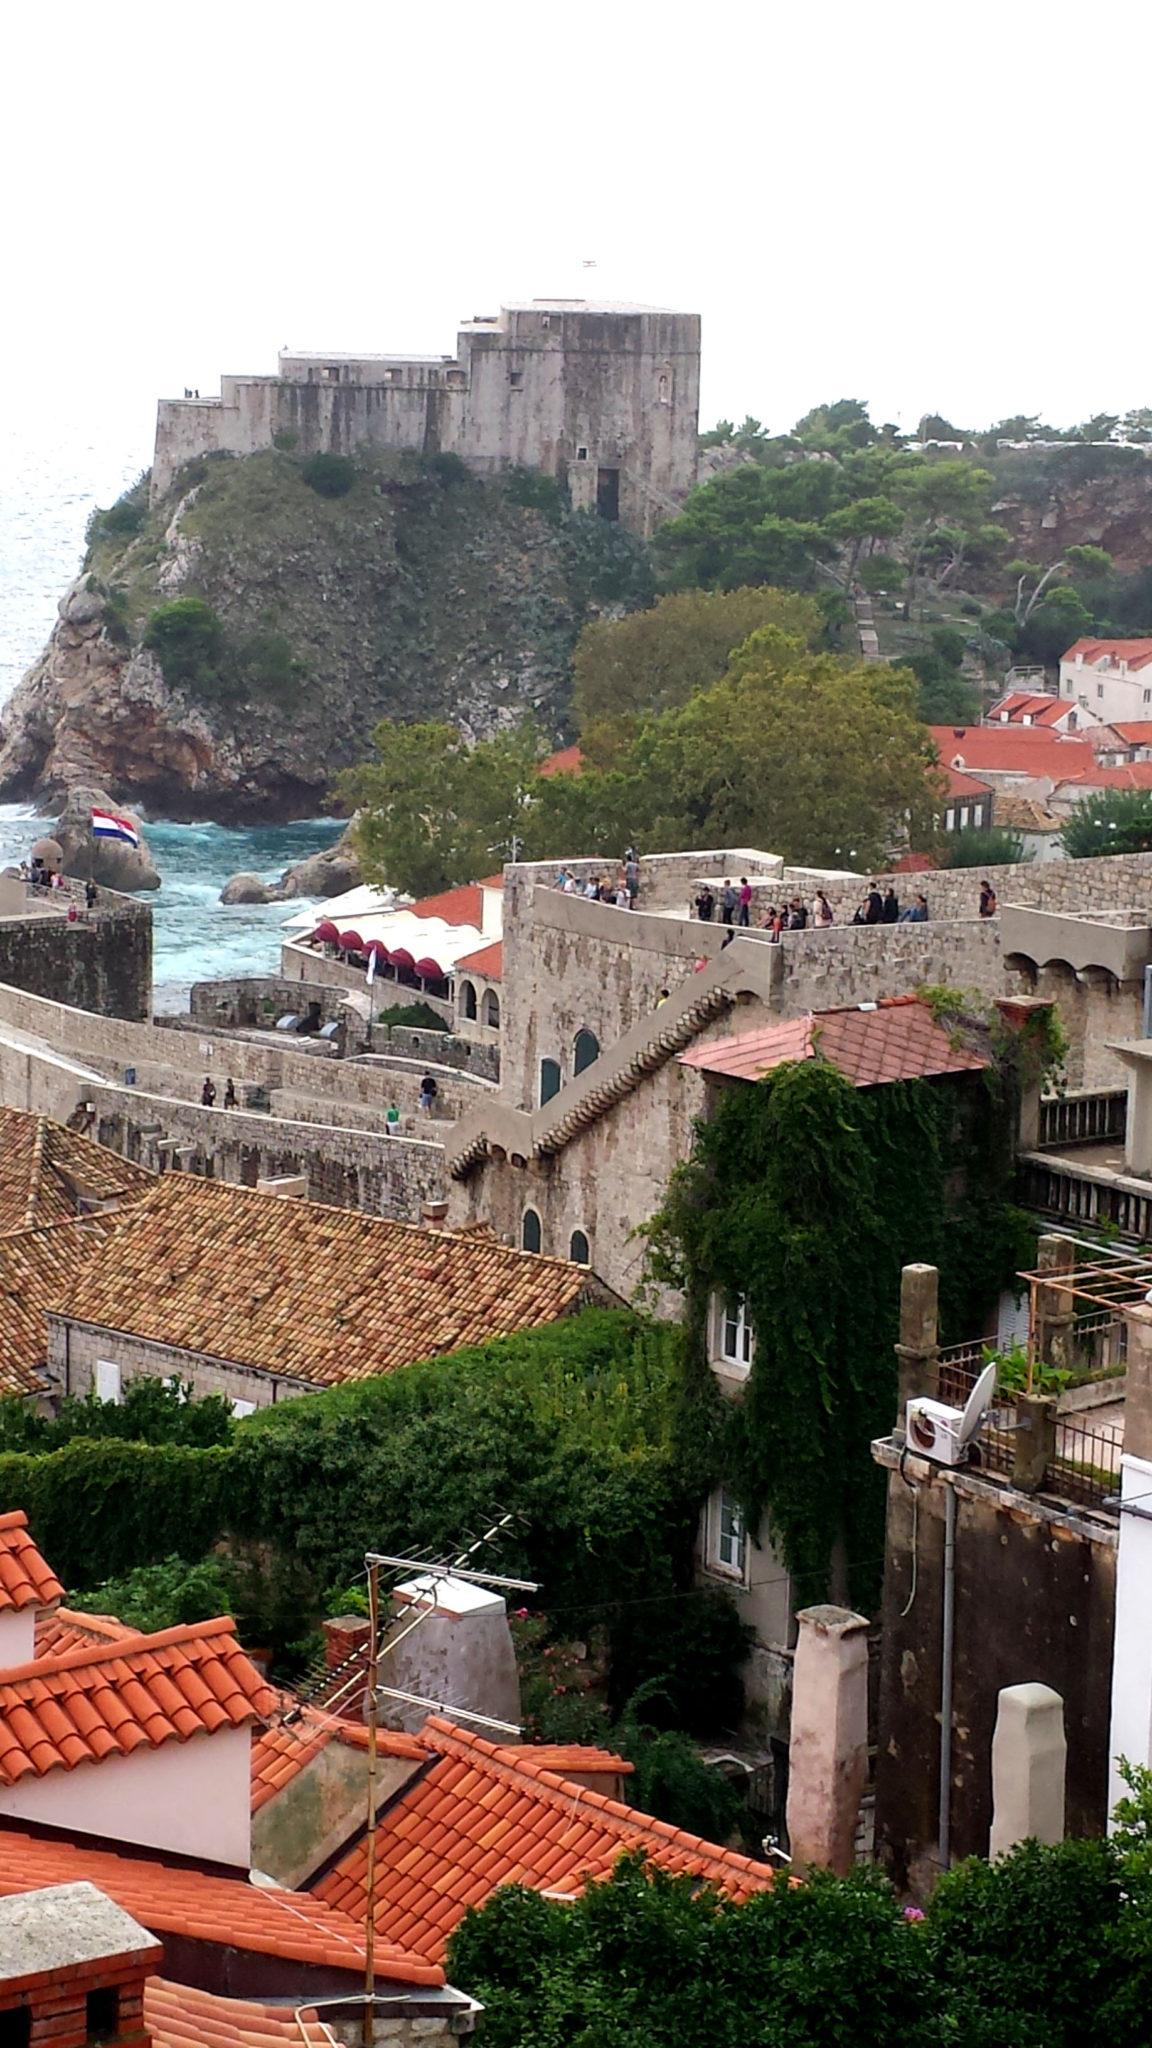 Hema_blog_mode_voyage_croatie_une_journee_a_dubrovnik_vue_sur_la_ville18